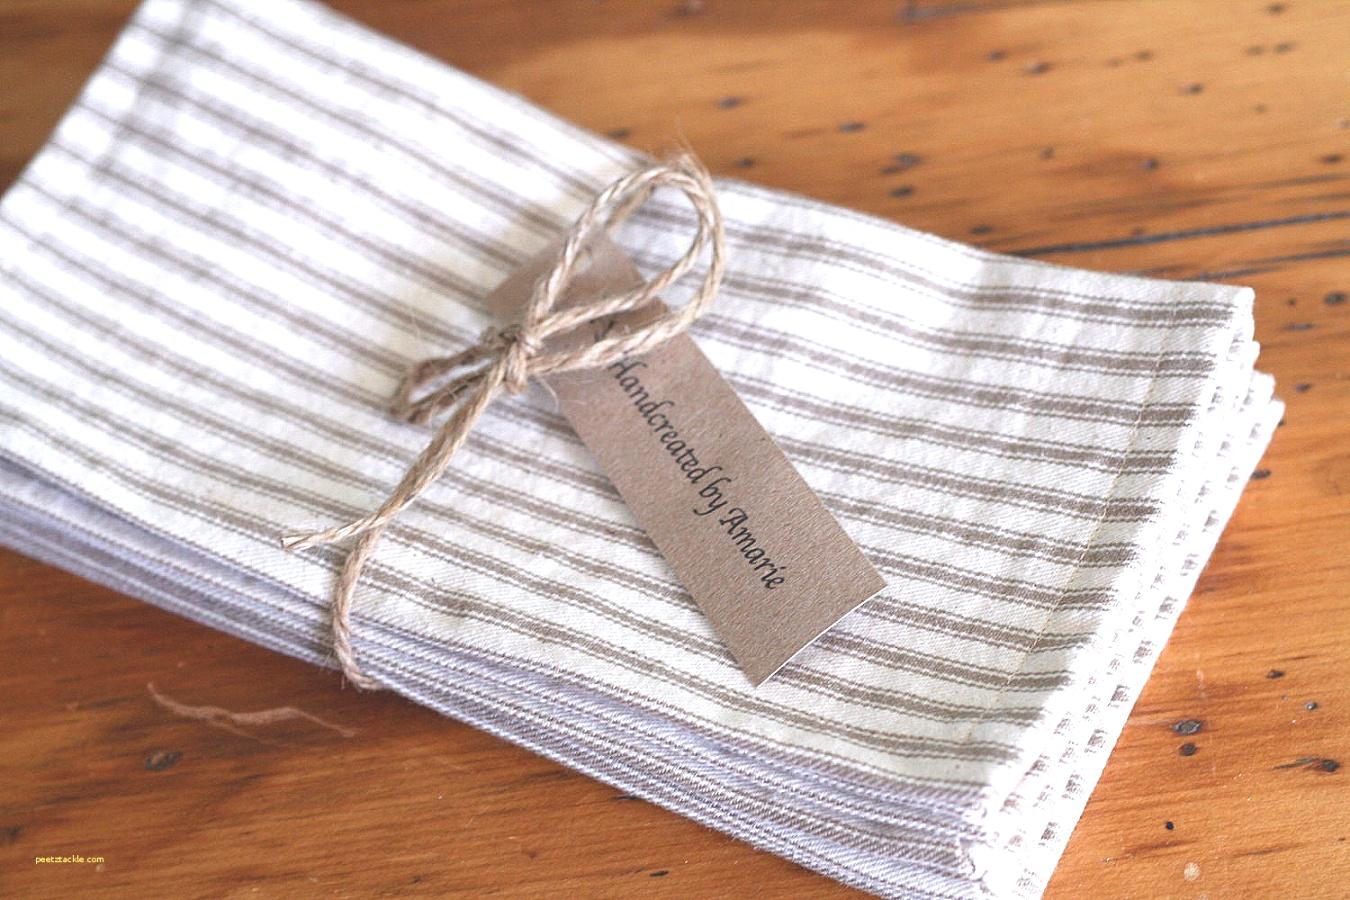 xochi table linens | Tablecloths. Lovely Xochi Tablecloths: Xochi Tablecloths Fresh ..